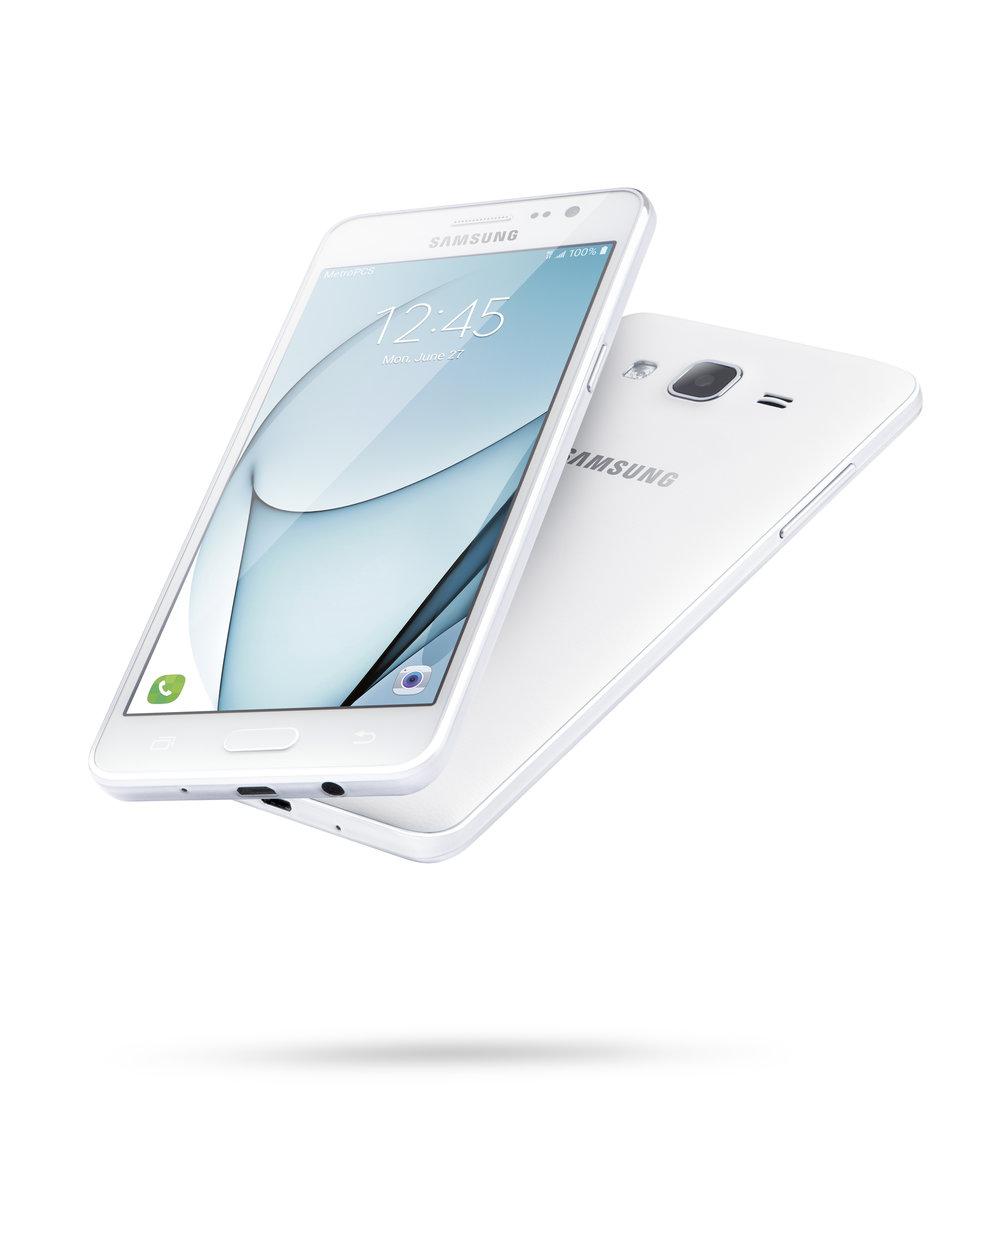 Samsung-Hero-4x5-01.JPG